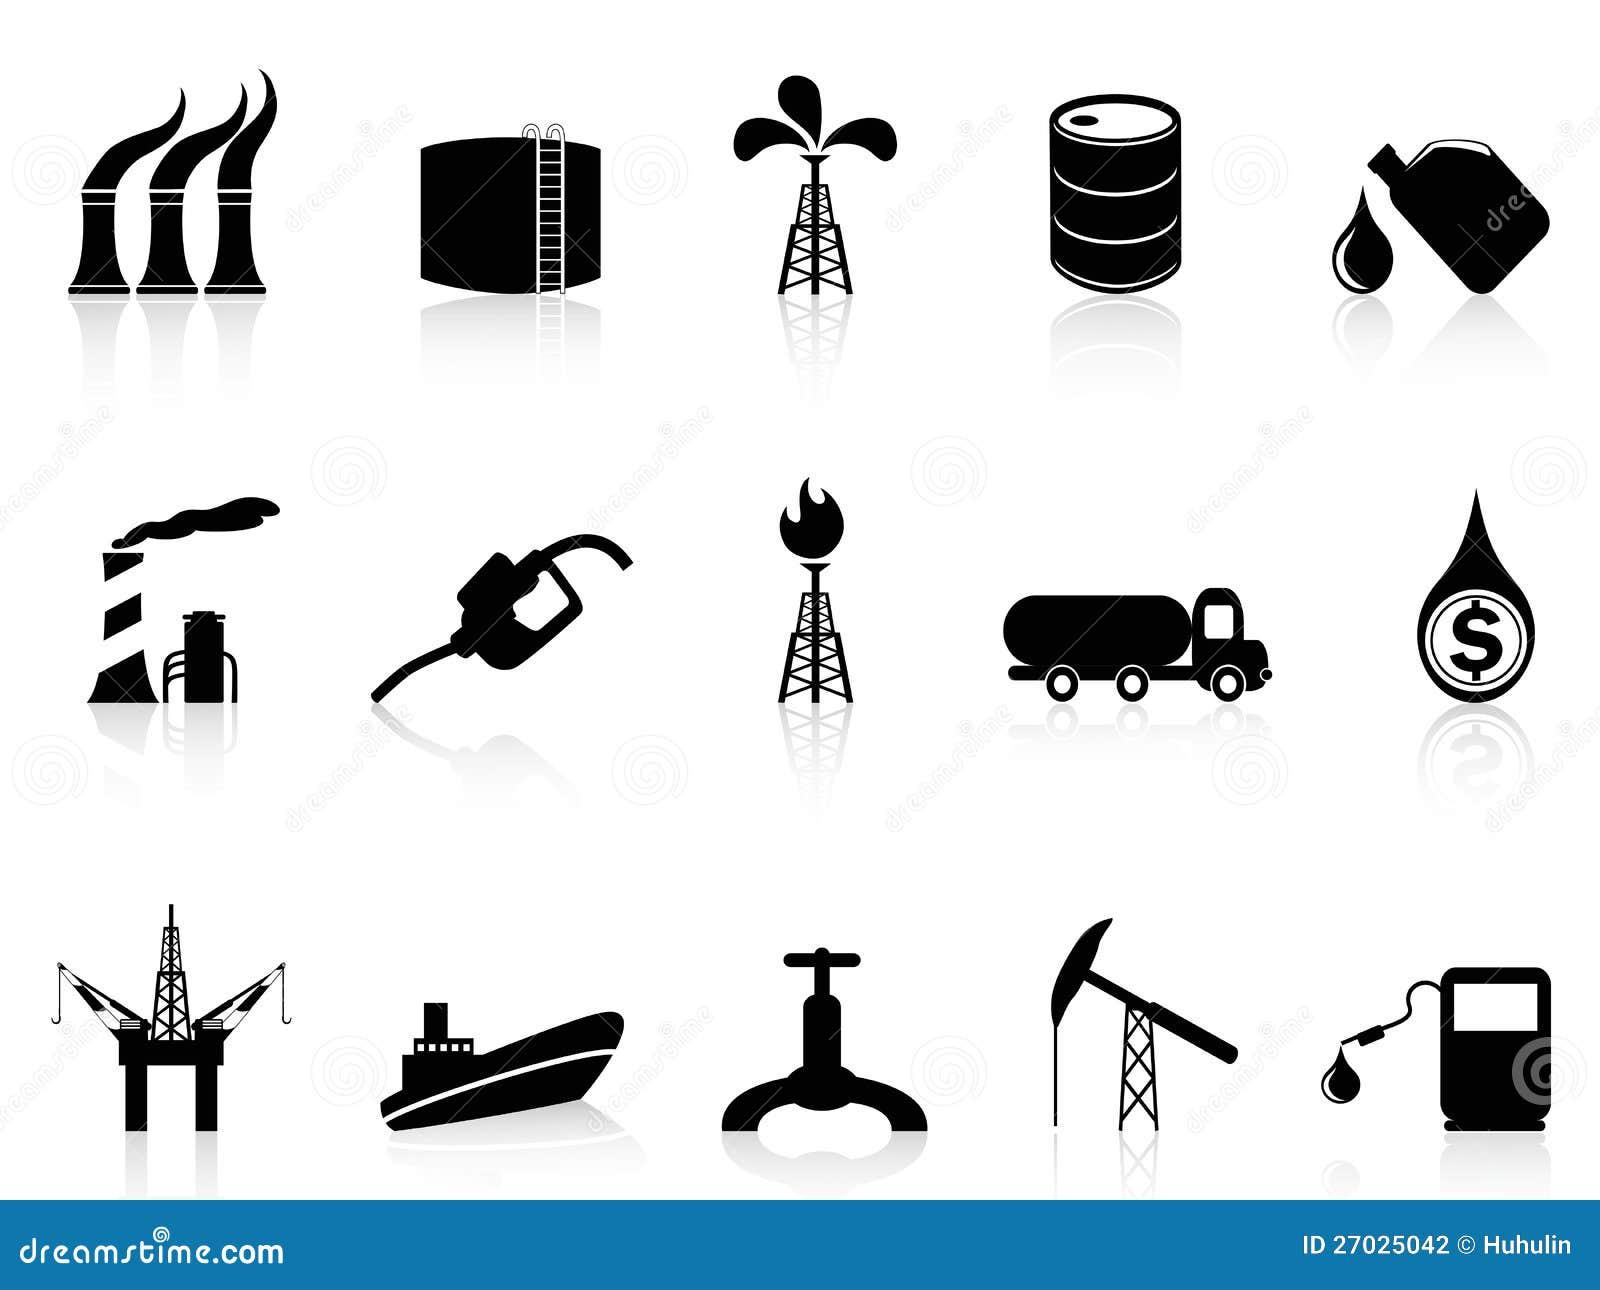 Oljeindustrisymbol